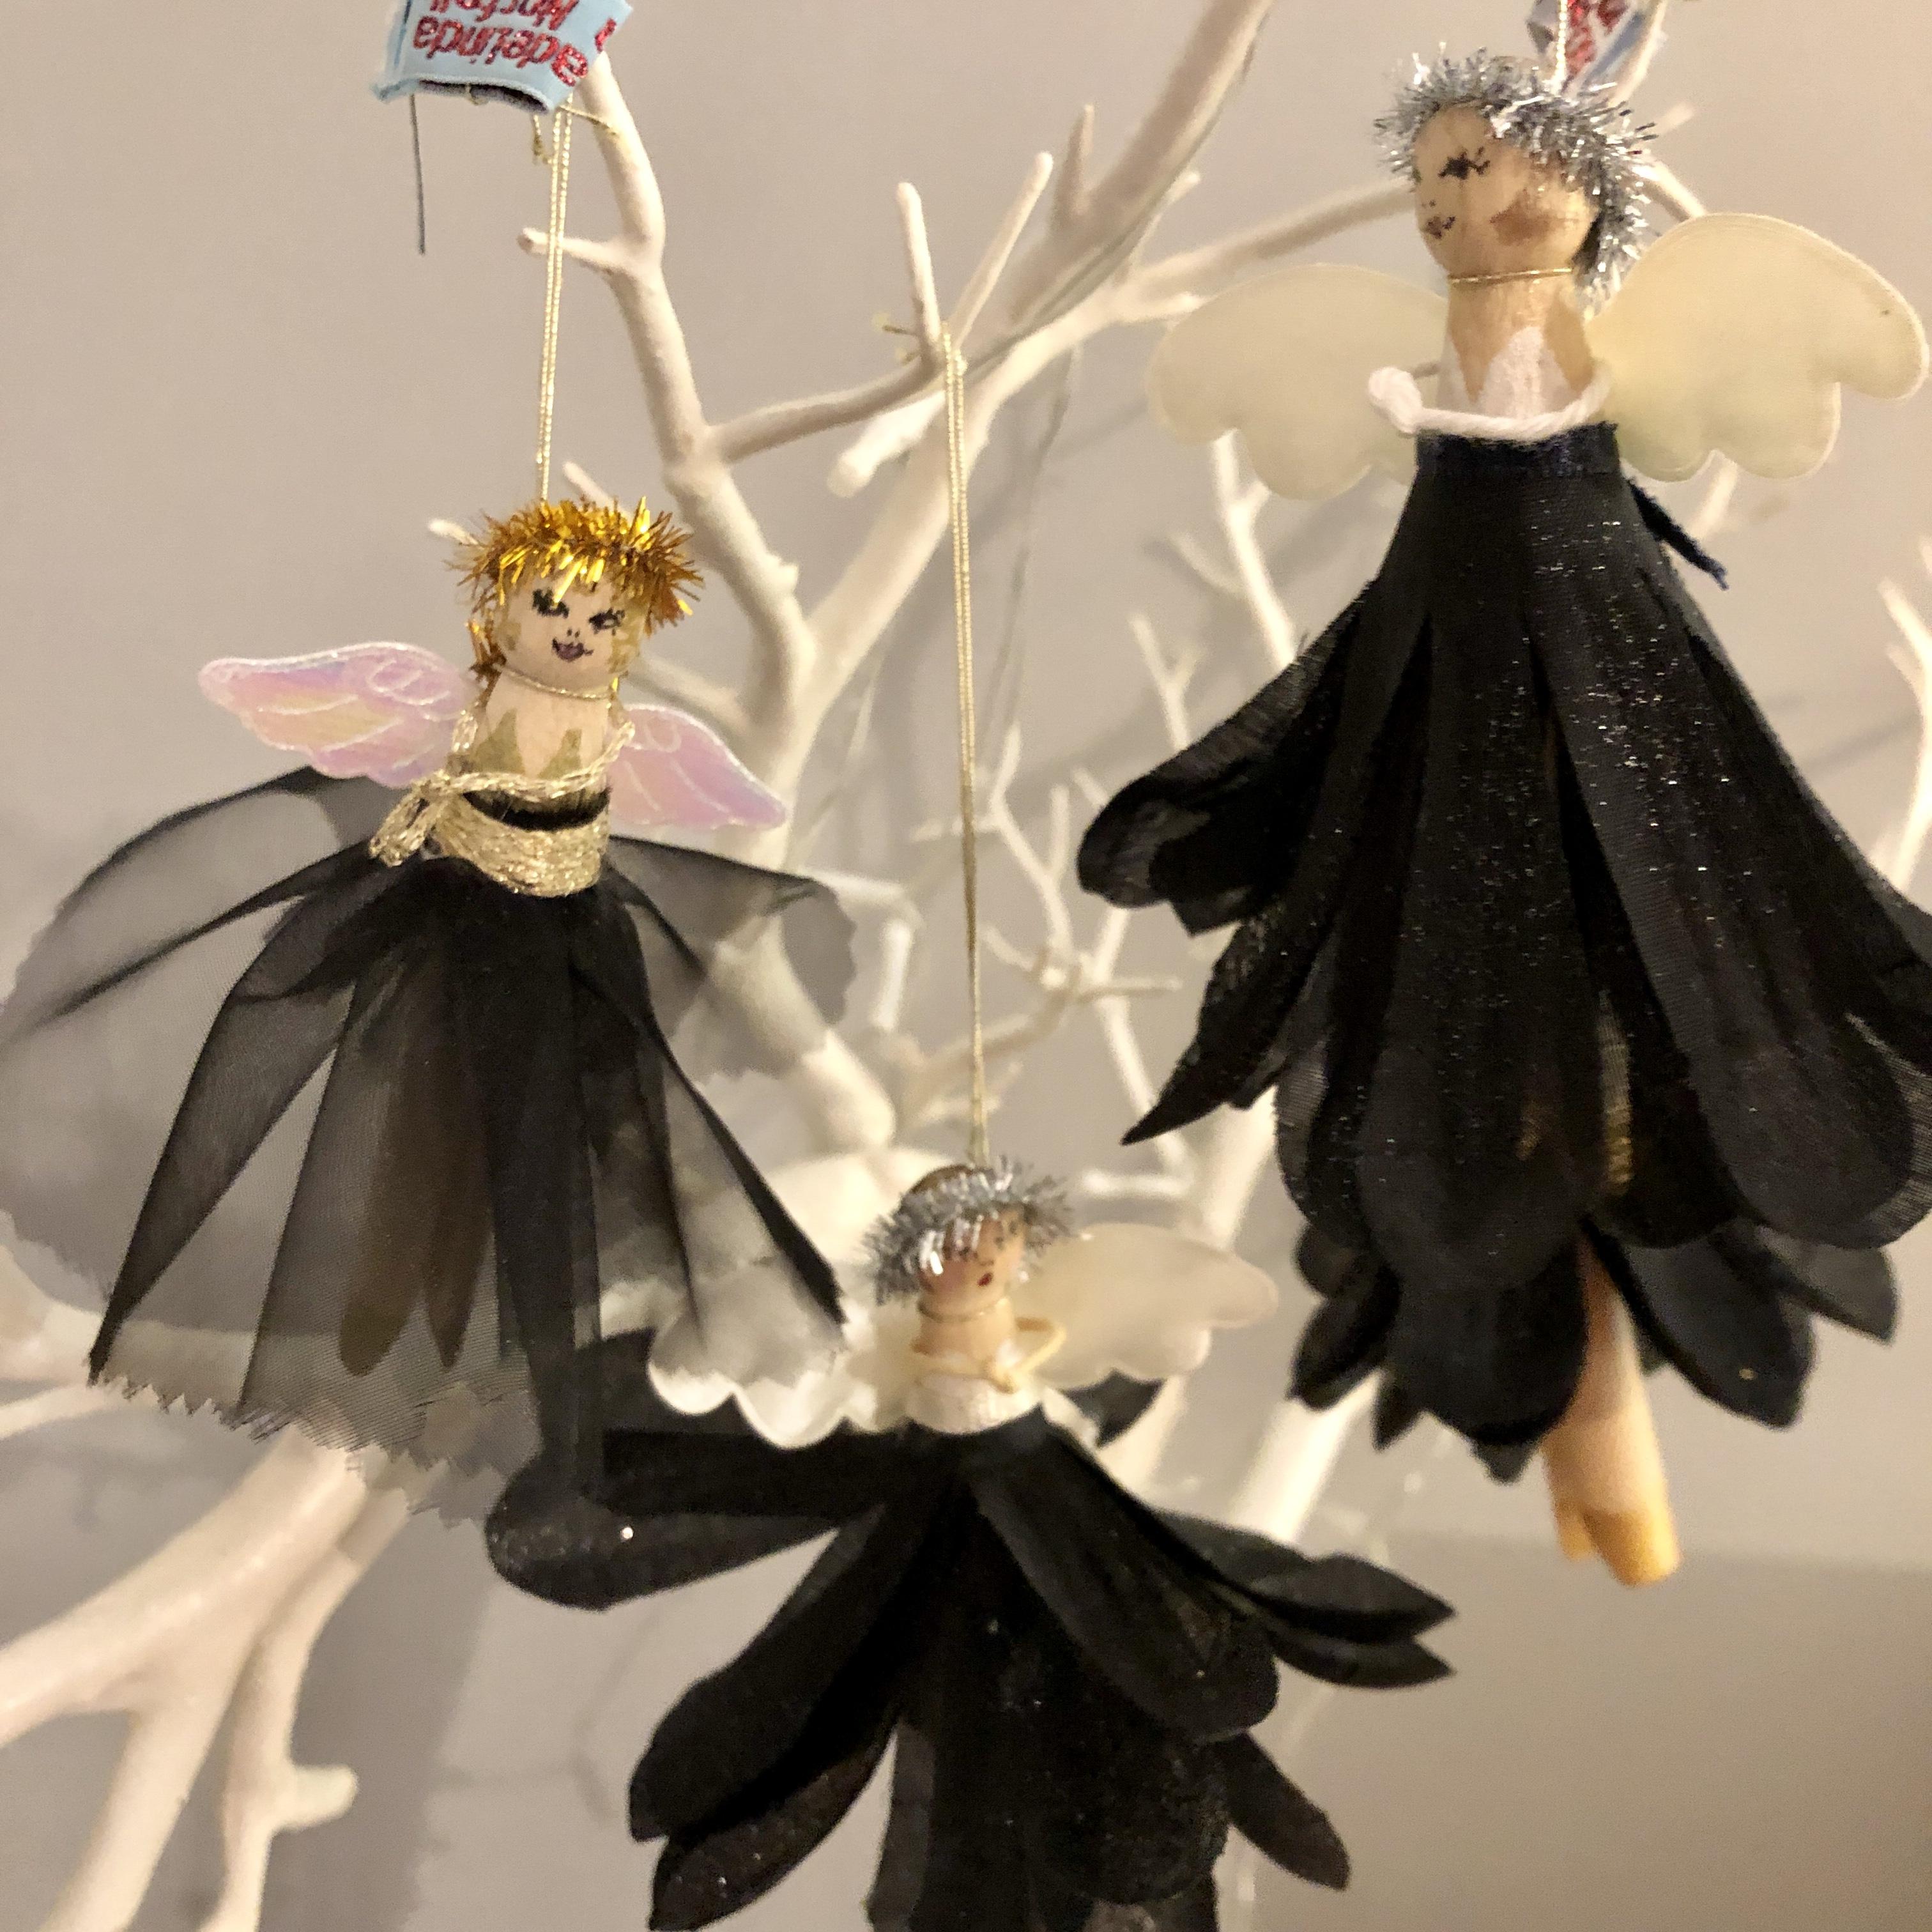 Black skirt peg doll fairy Christmas decoration by HandmadeLinda